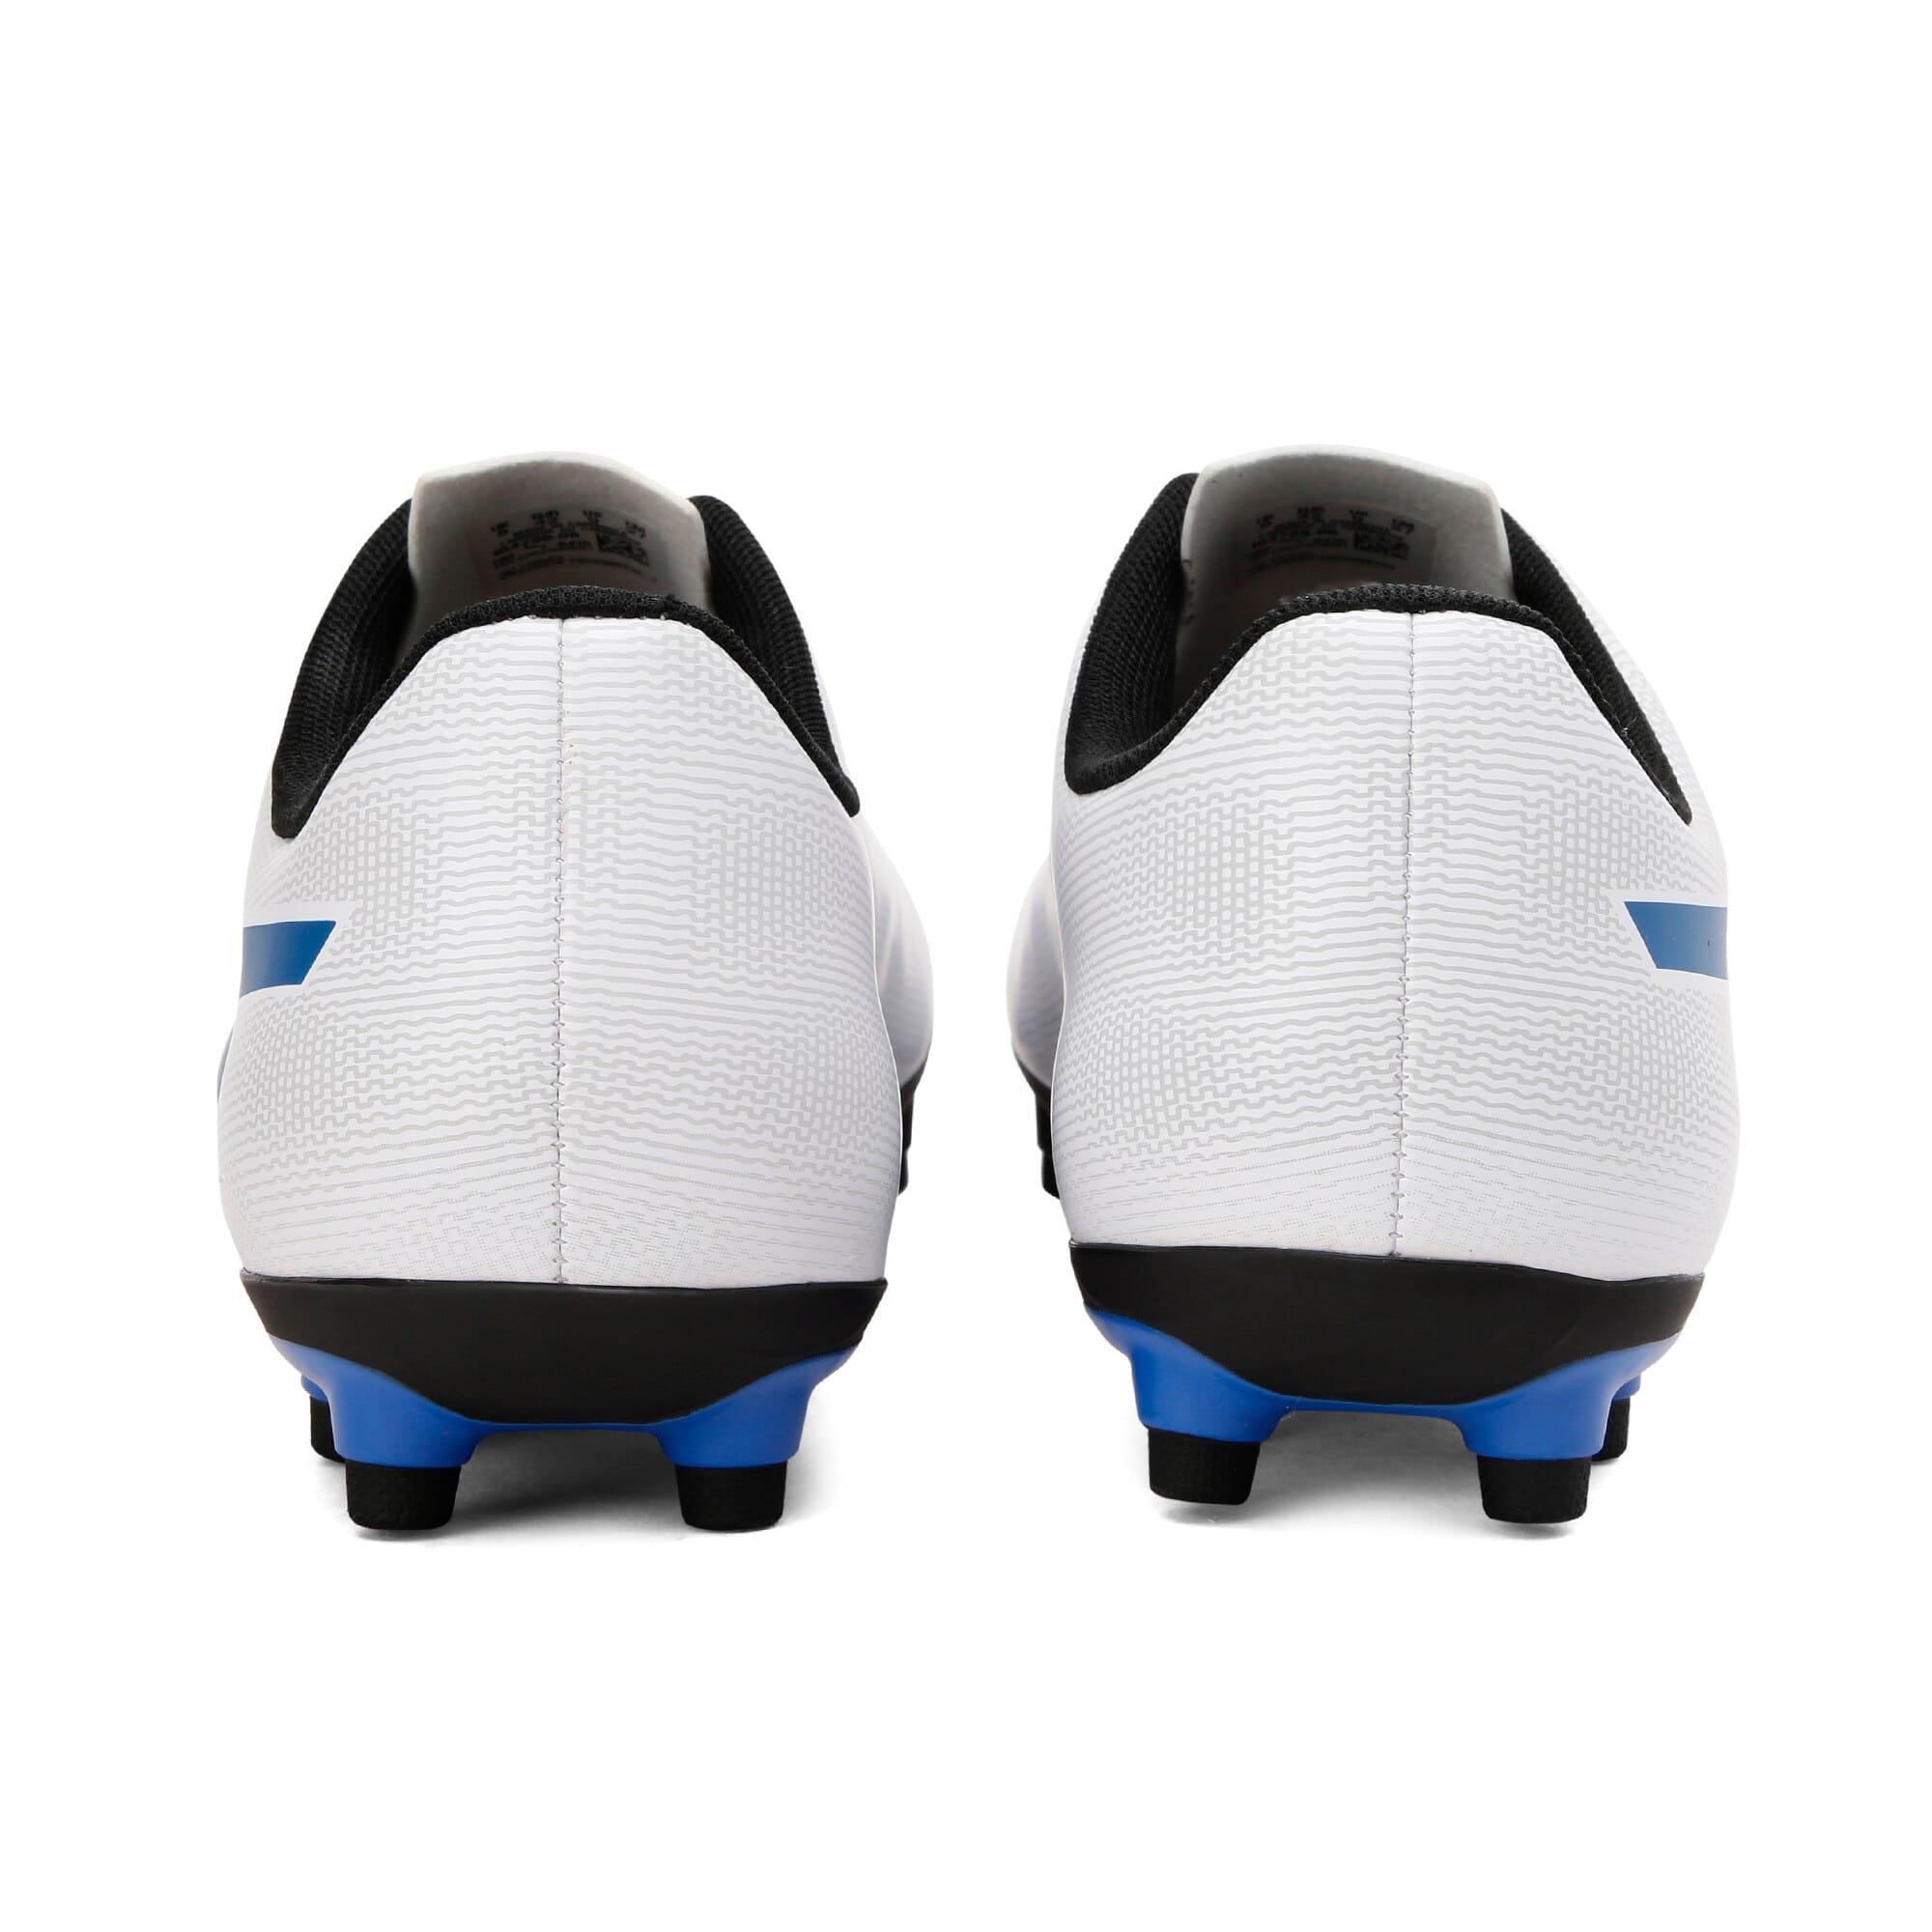 Thumbnail 3 of Rapido FG Youth Football Boots, White-Royal Blue-Light Gray, medium-IND